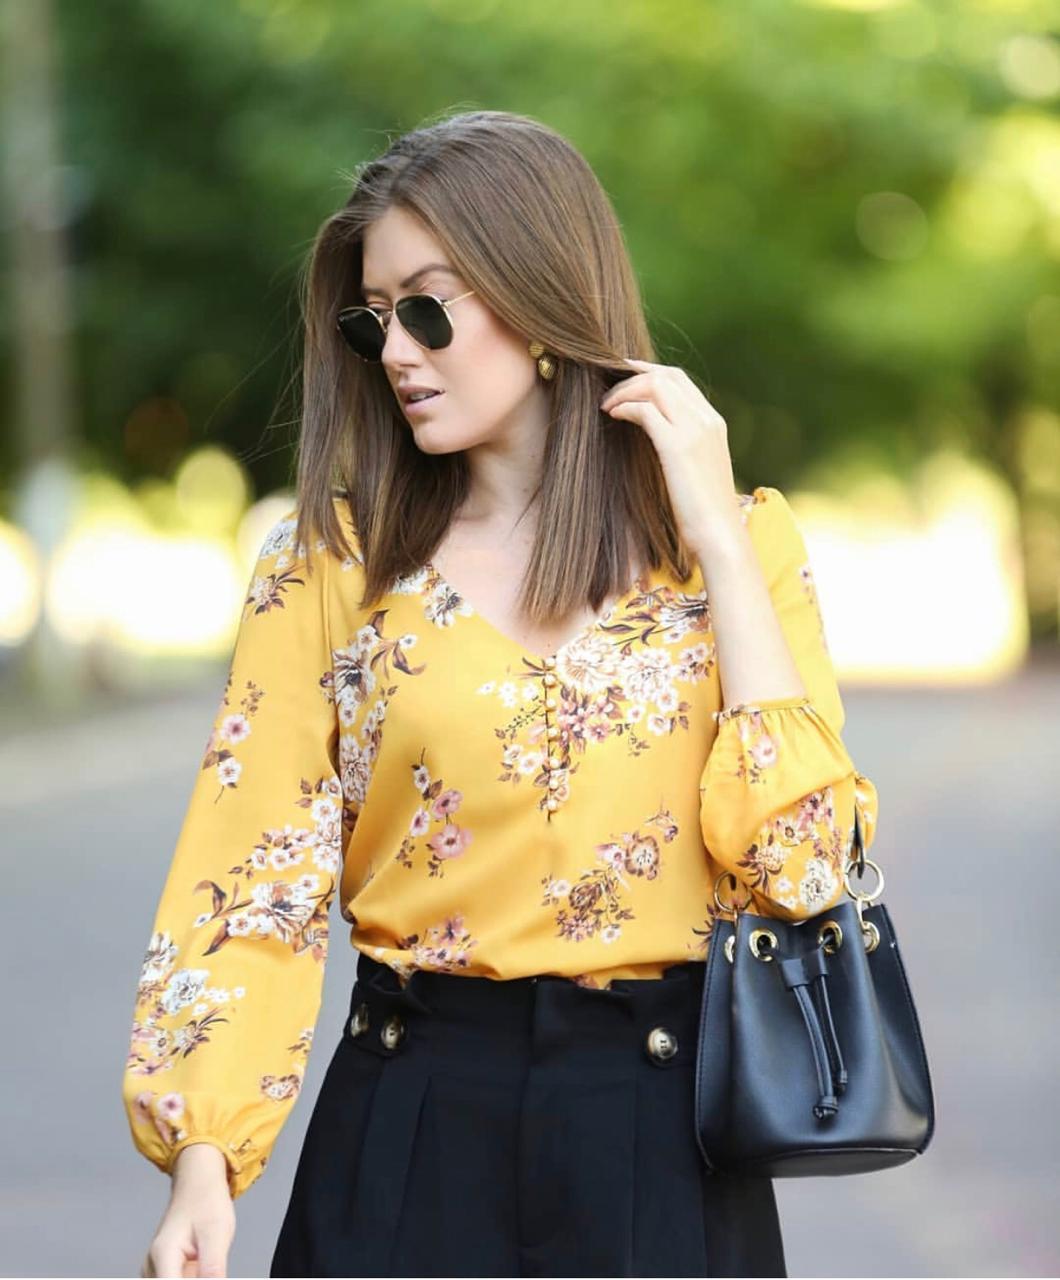 Blusa Eliete Crepe Floral Cores Rose e Mostarda